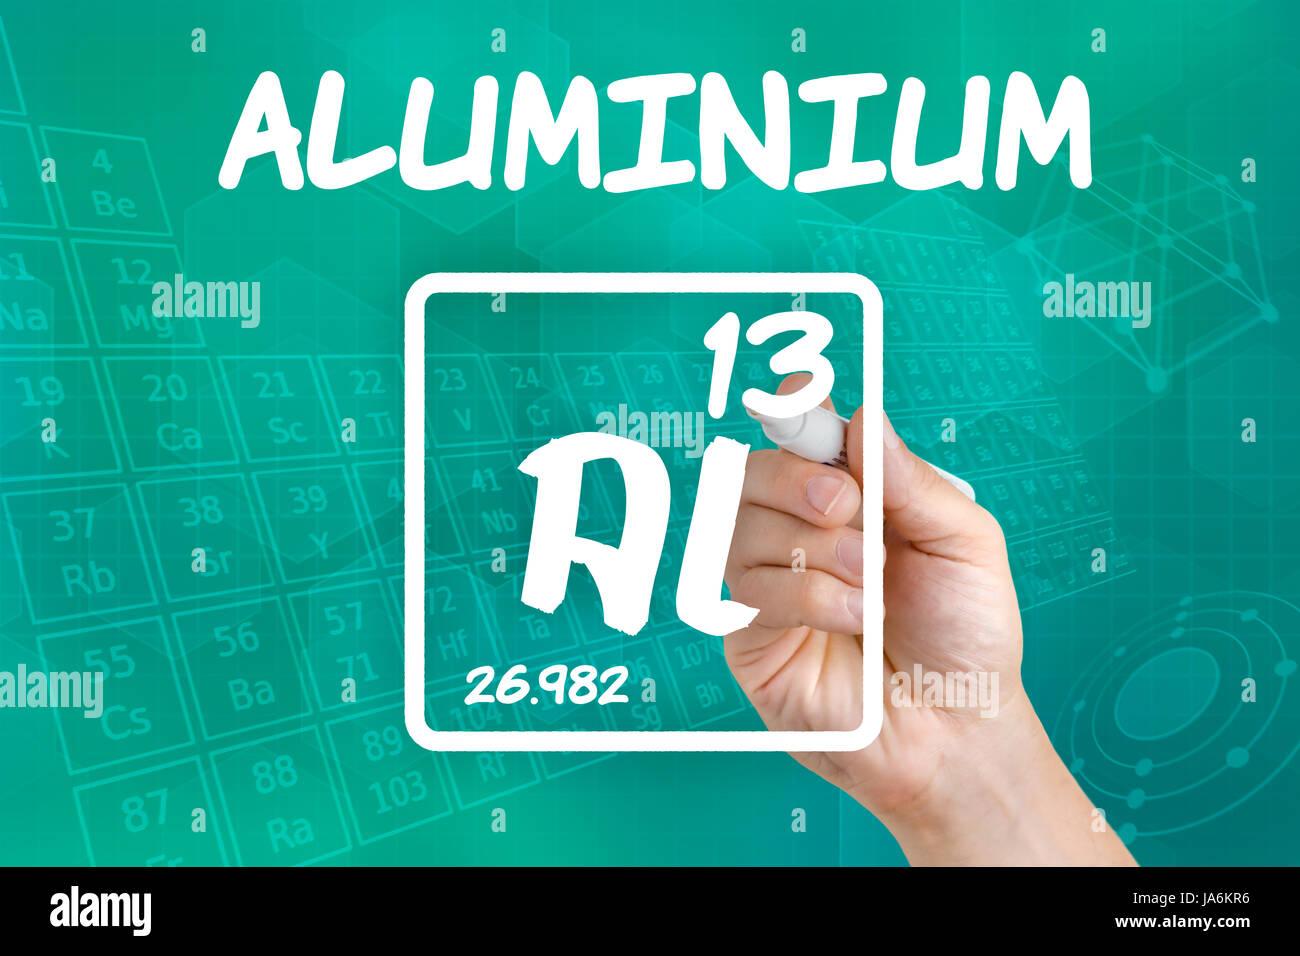 Symbol of the chemical element aluminum stock photo royalty free symbol of the chemical element aluminum gamestrikefo Image collections